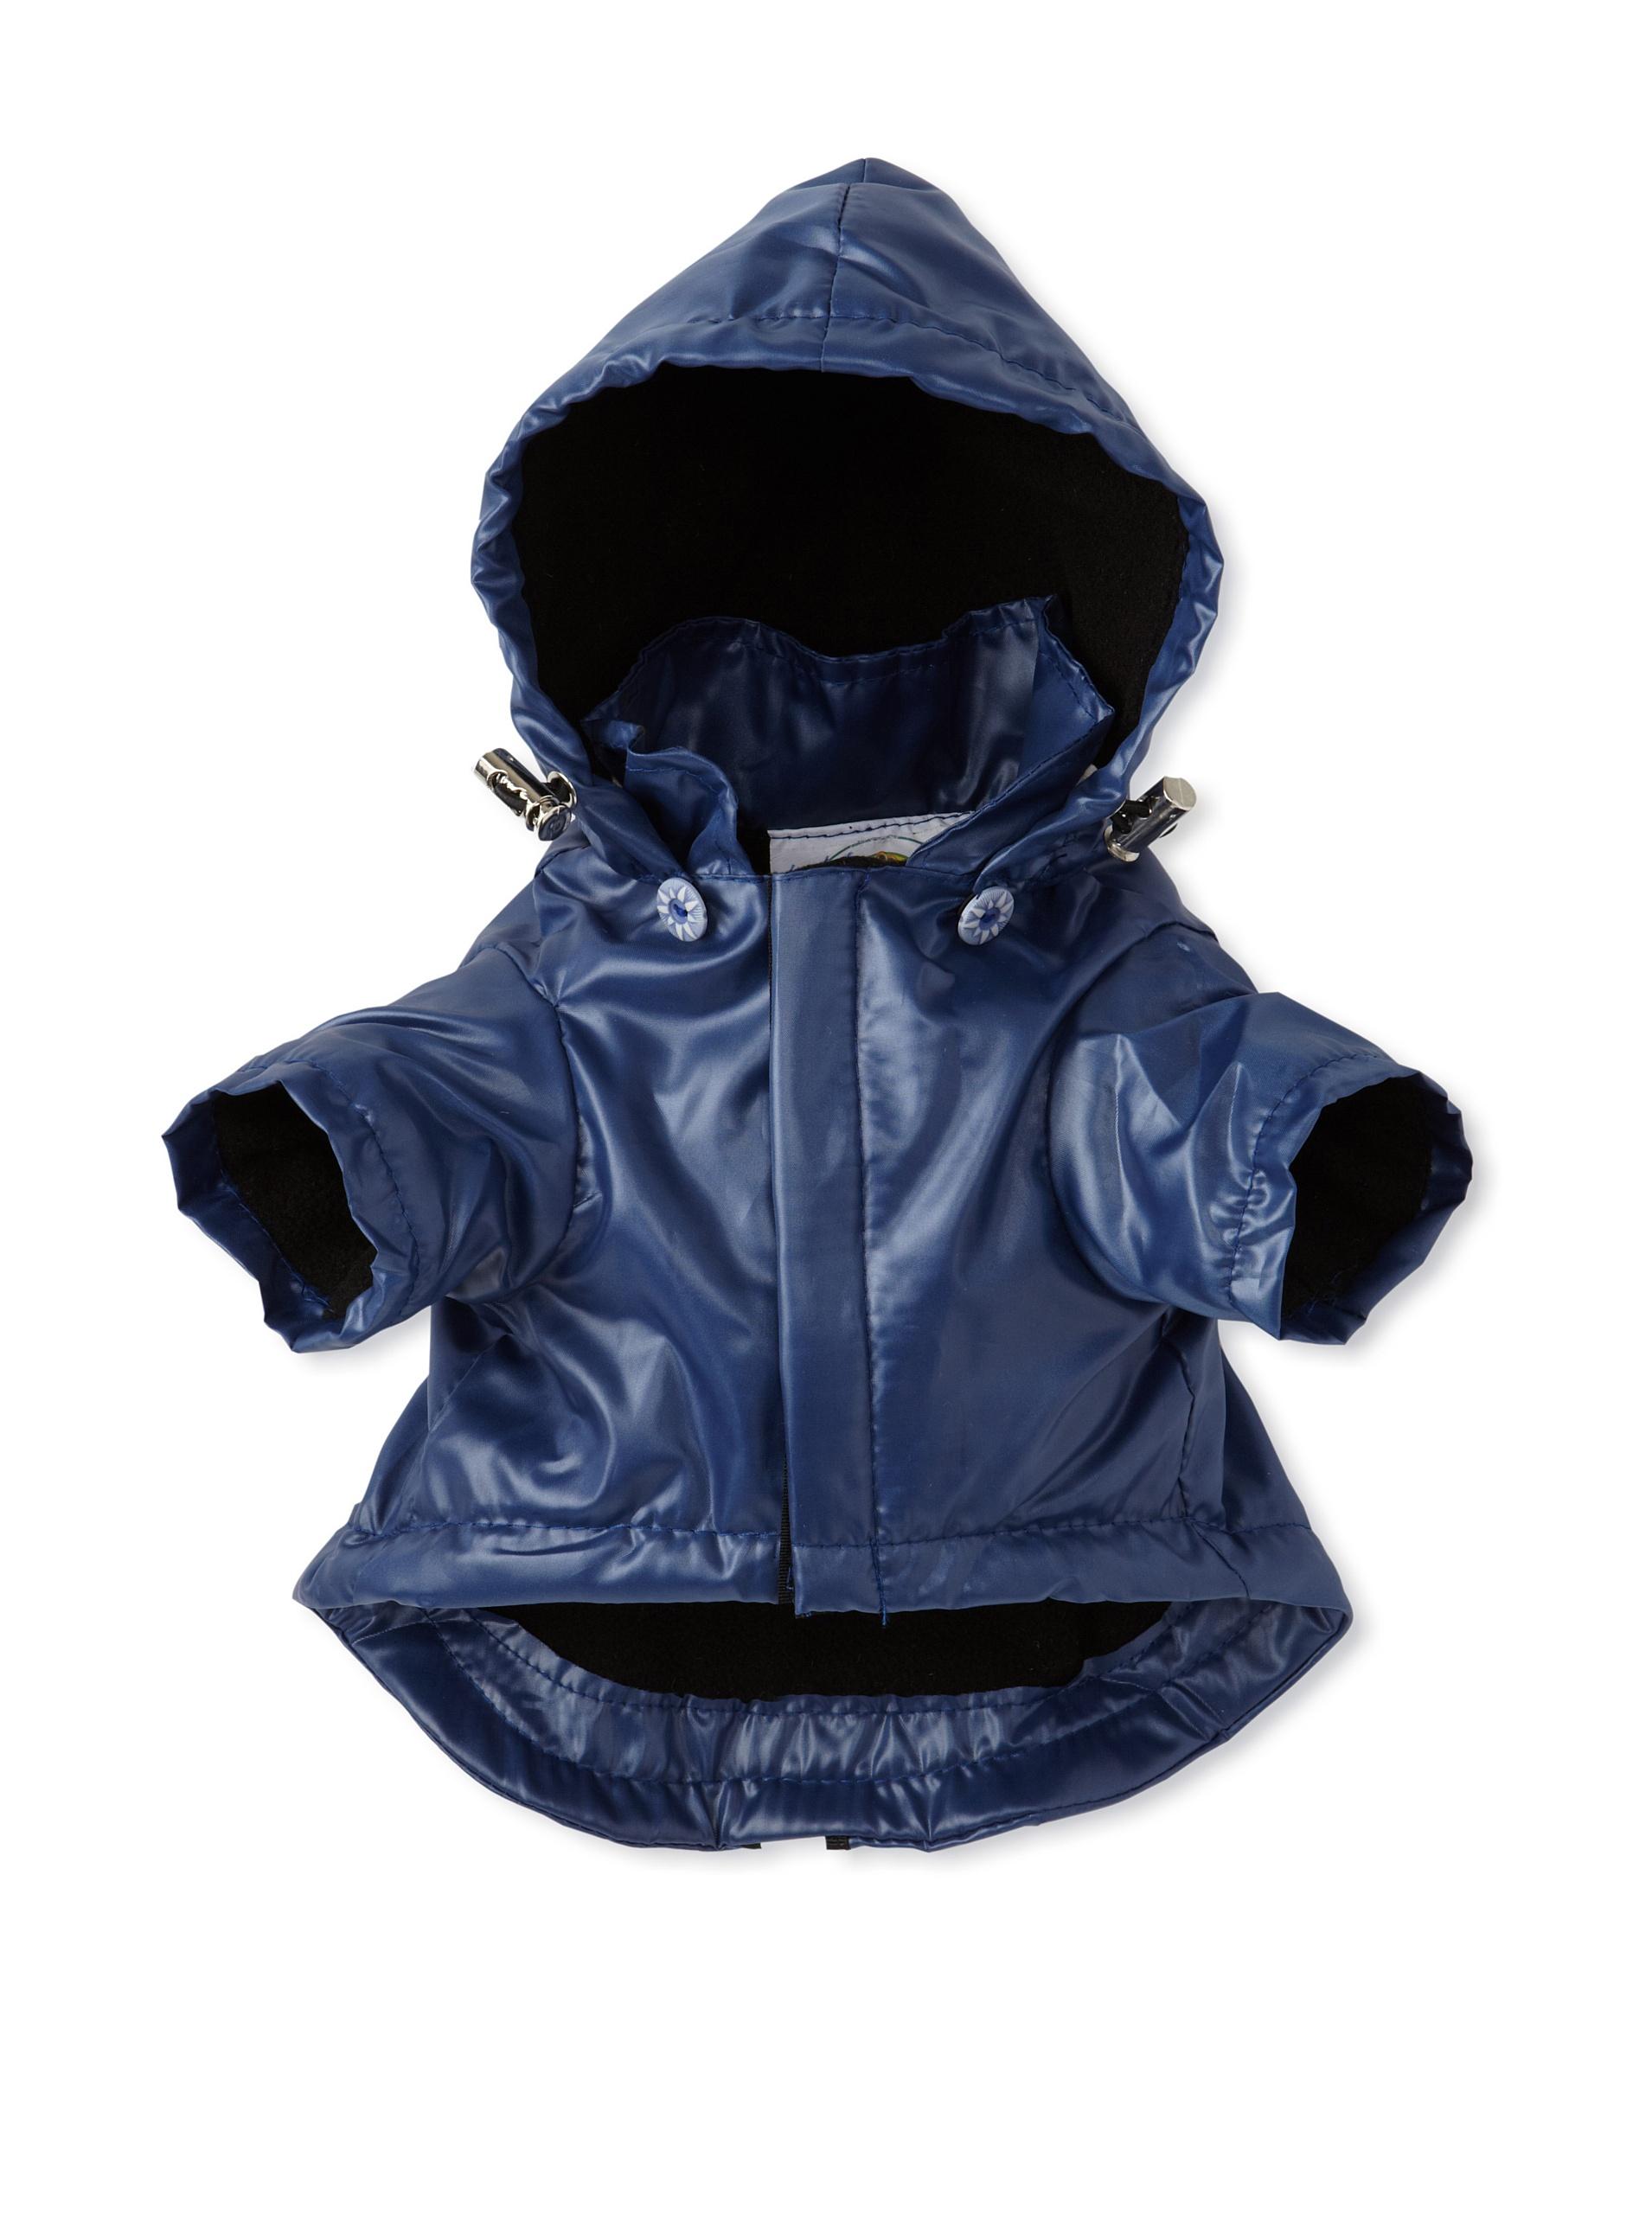 Pet Life Reflecta-Sport Rain Jacket and Windbreaker (Dark Blue)